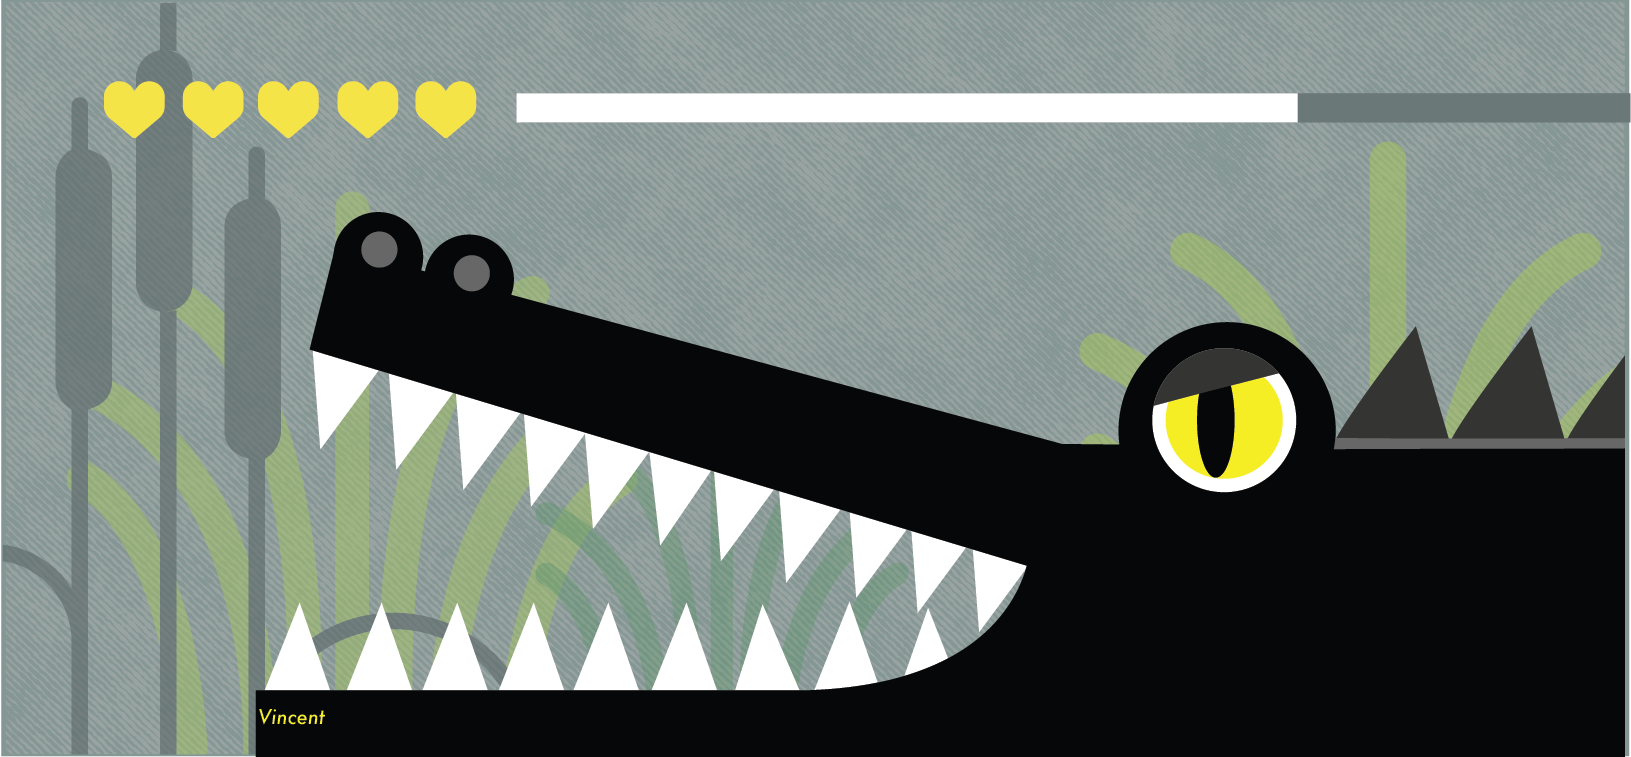 Alligator Game